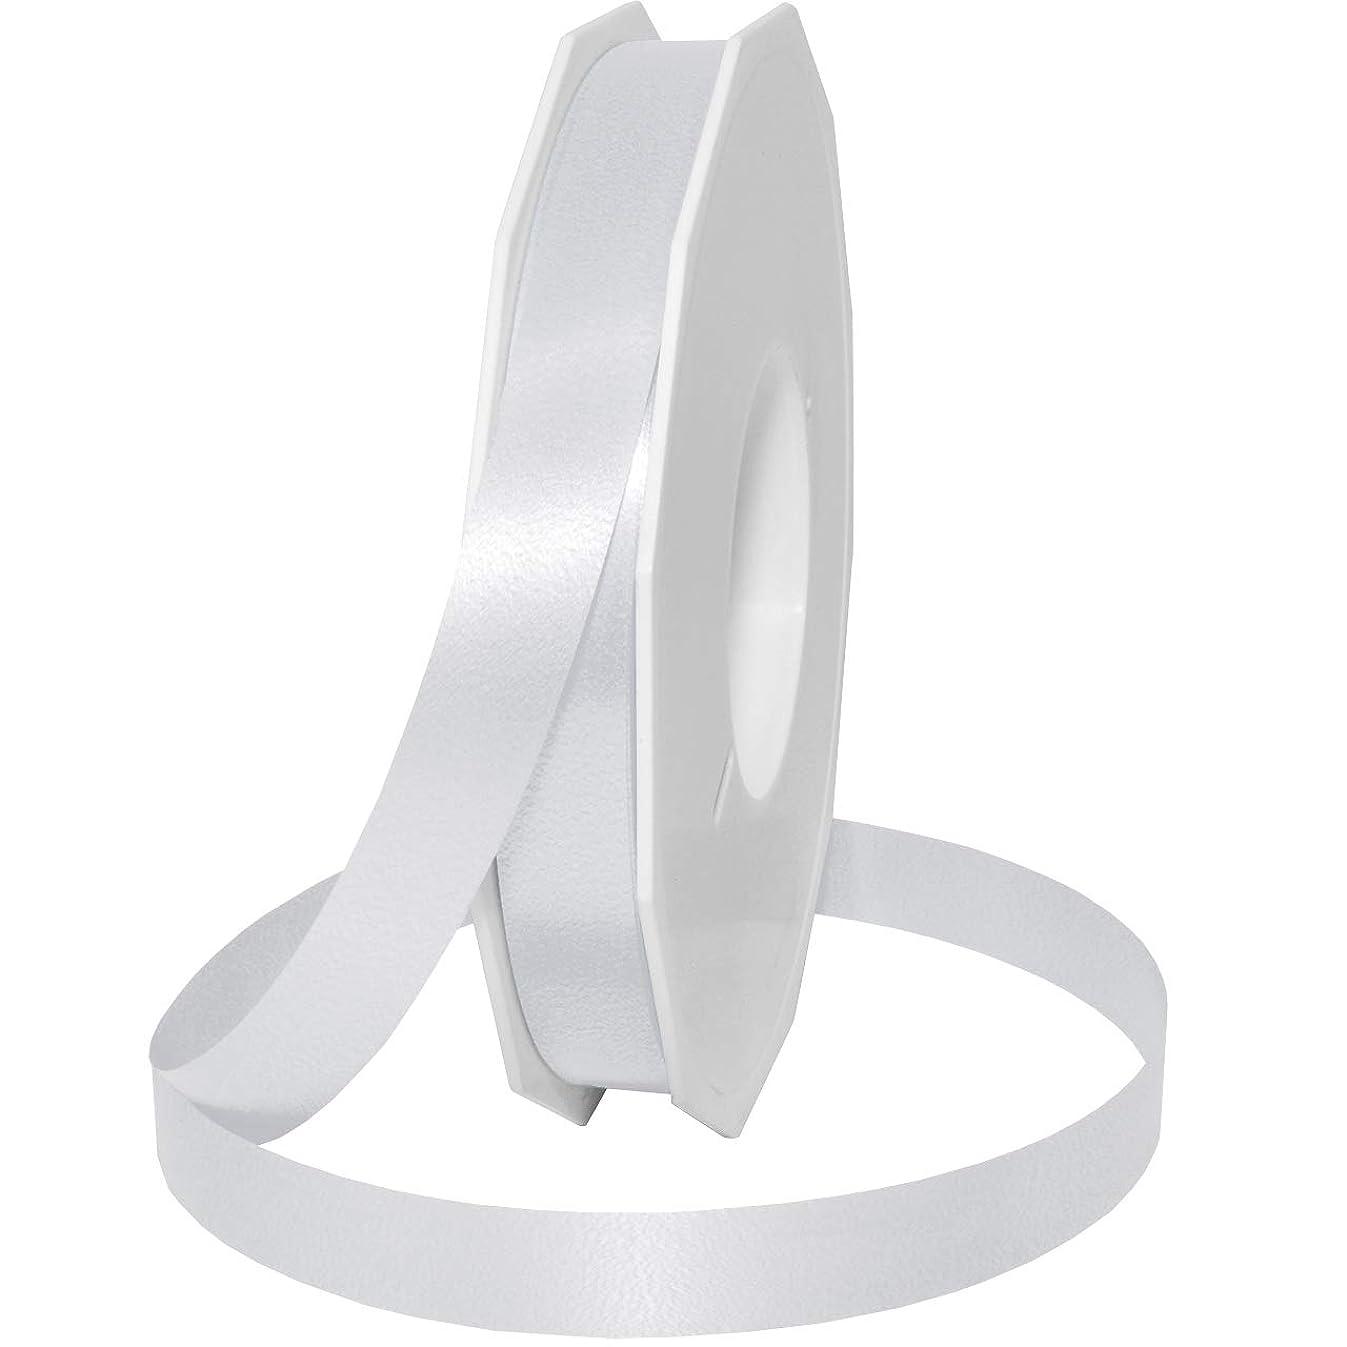 Morex Ribbon Style 187 Ribbon, 5/8 inch by 100 Yards, White